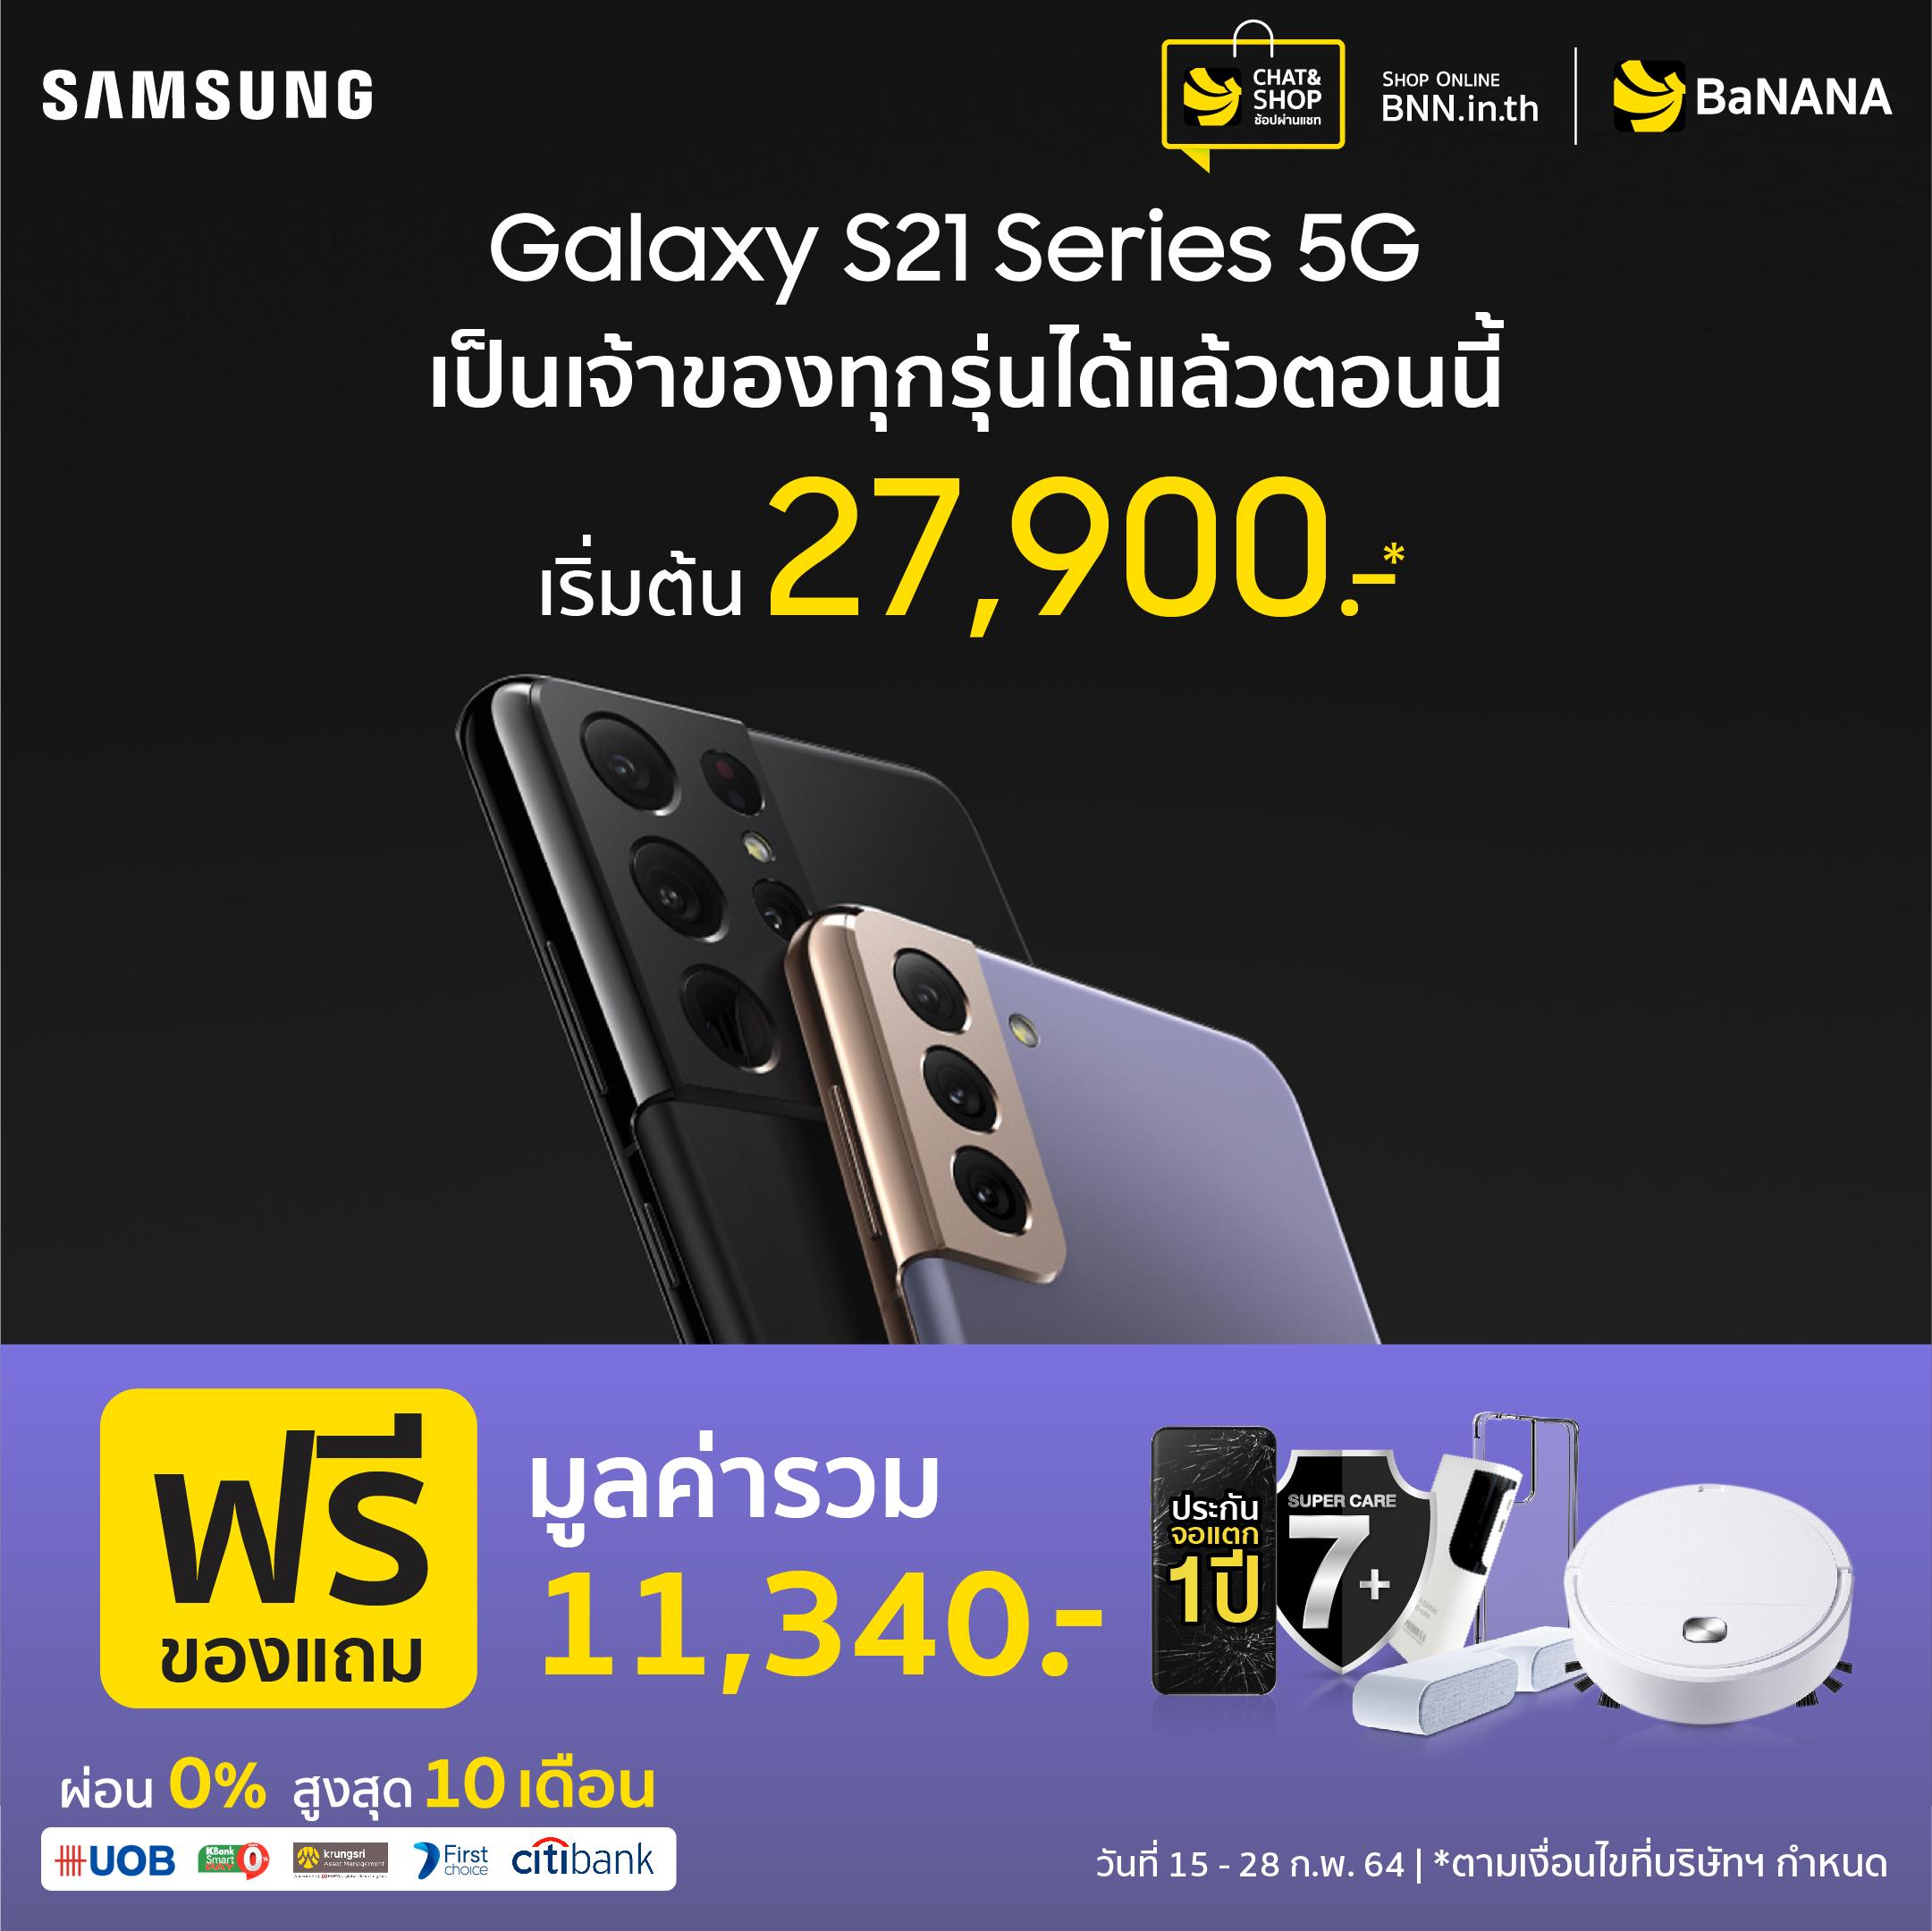 bnn.in.th - Galaxy S21 Series 5G เริ่ม 27,900.-* รับฟรี! ของแถมมูลค่ารวม 11,340.-